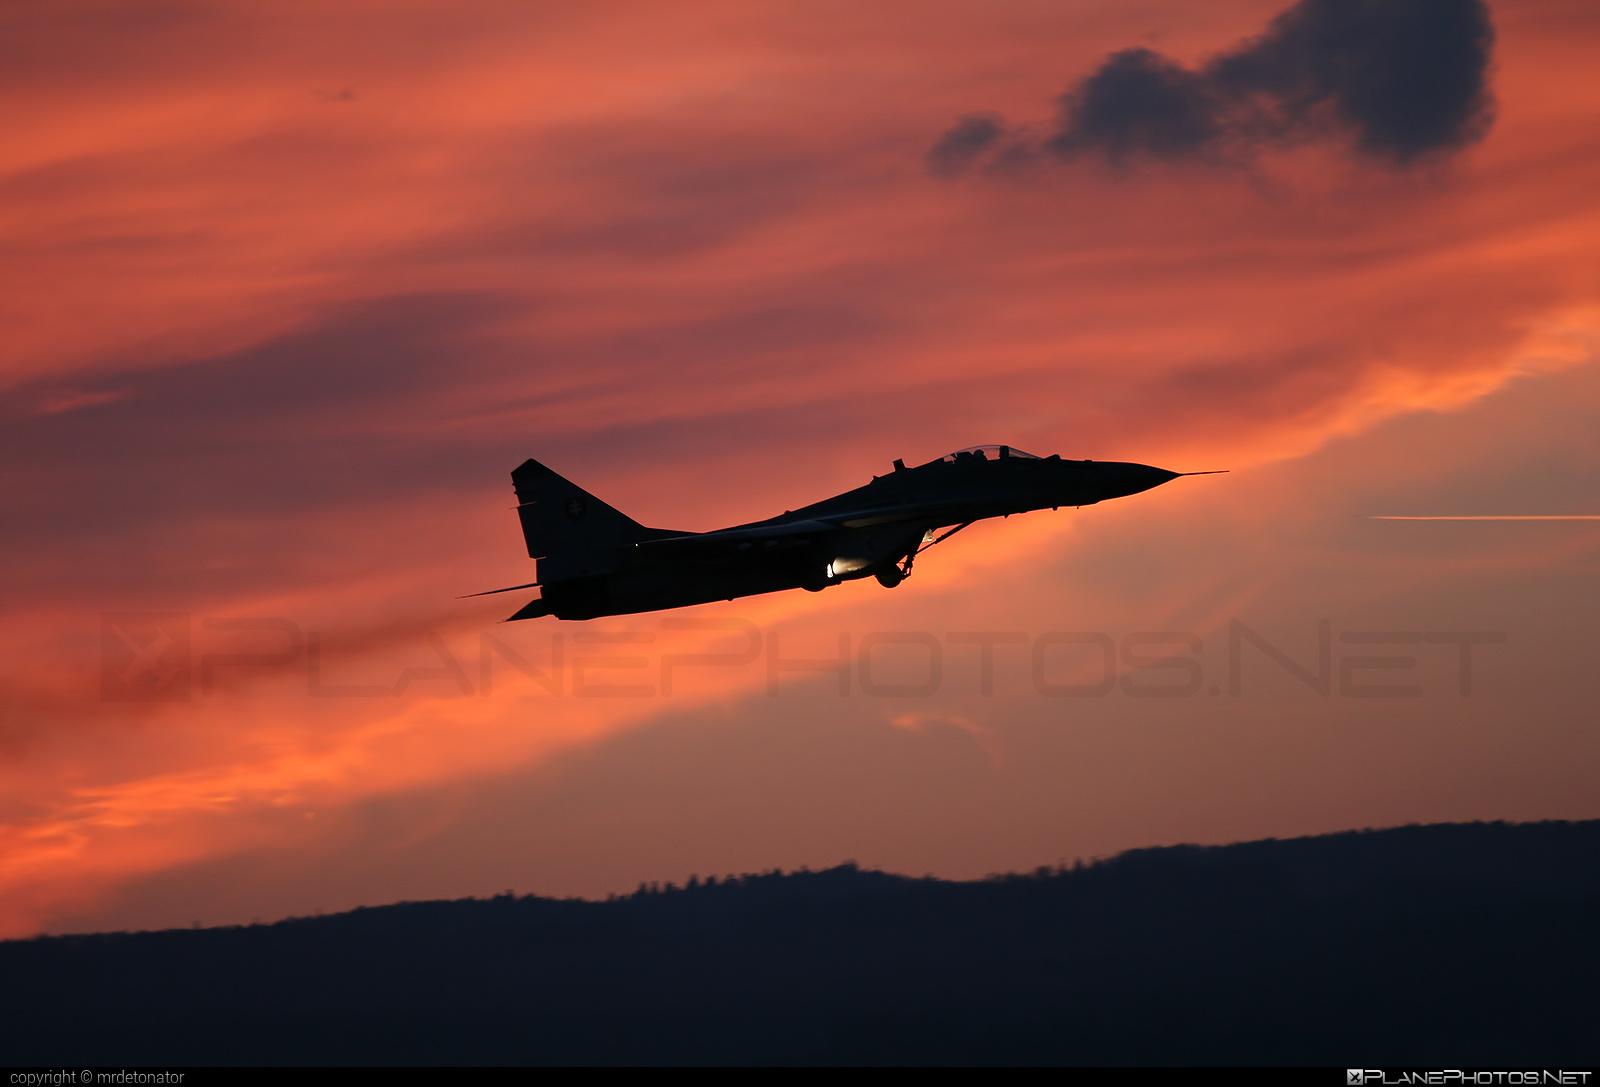 Vzdušné sily OS SR (Slovak Air Force) Mikoyan-Gurevich MiG-29AS - 6124 #mig #mig29 #mig29as #mikoyangurevich #slovakairforce #vzdusnesilyossr